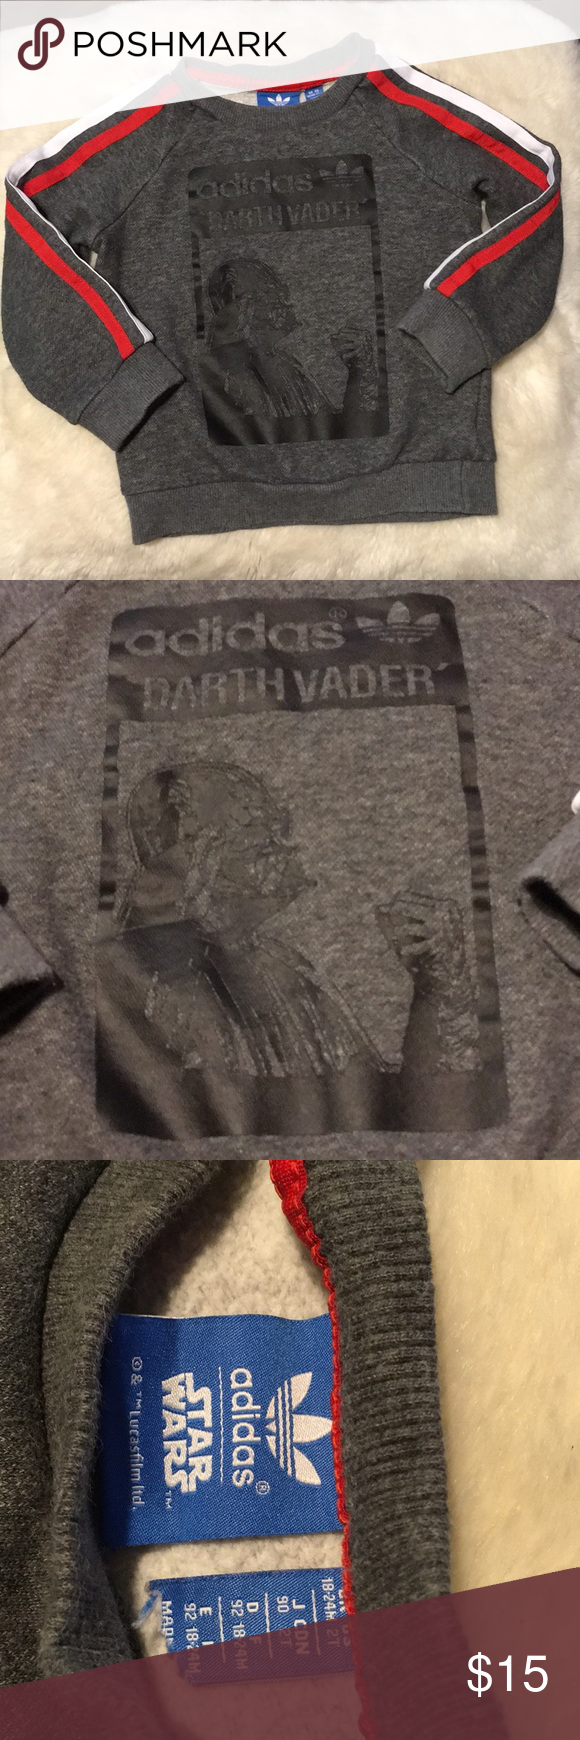 Adidas X Star Wars Boys Sweatshirt Darth Vader Boys Sweatshirts Womens Sweatshirts Fashion Sweatshirt Street Style [ 1740 x 580 Pixel ]